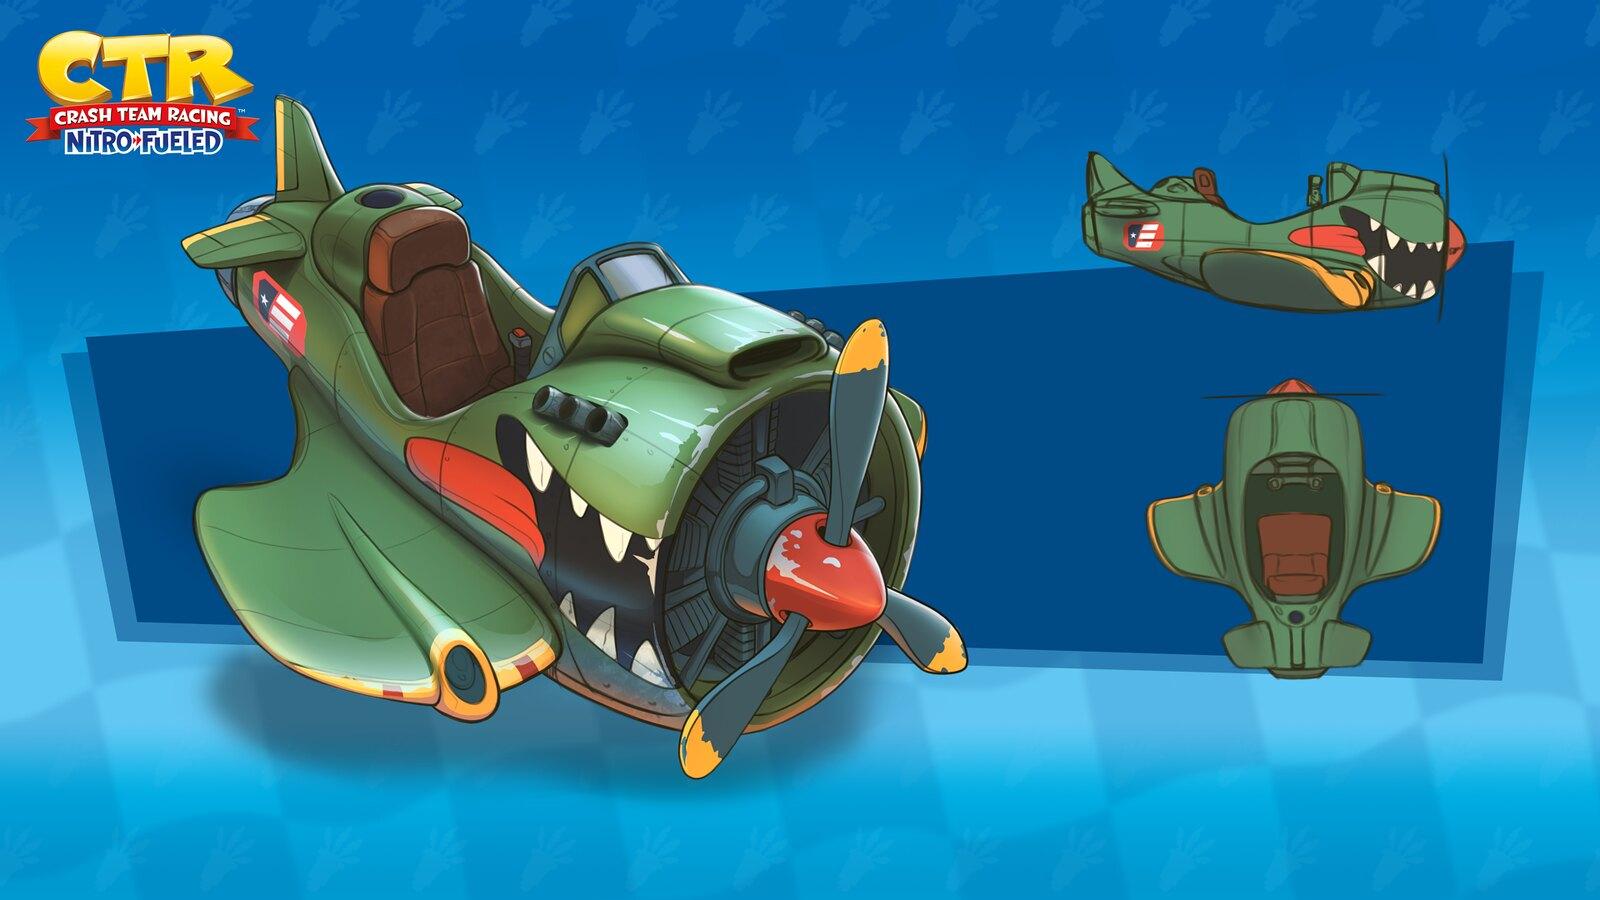 Crash Team Racing: Nitro Fueled - Firehawk Concept Art